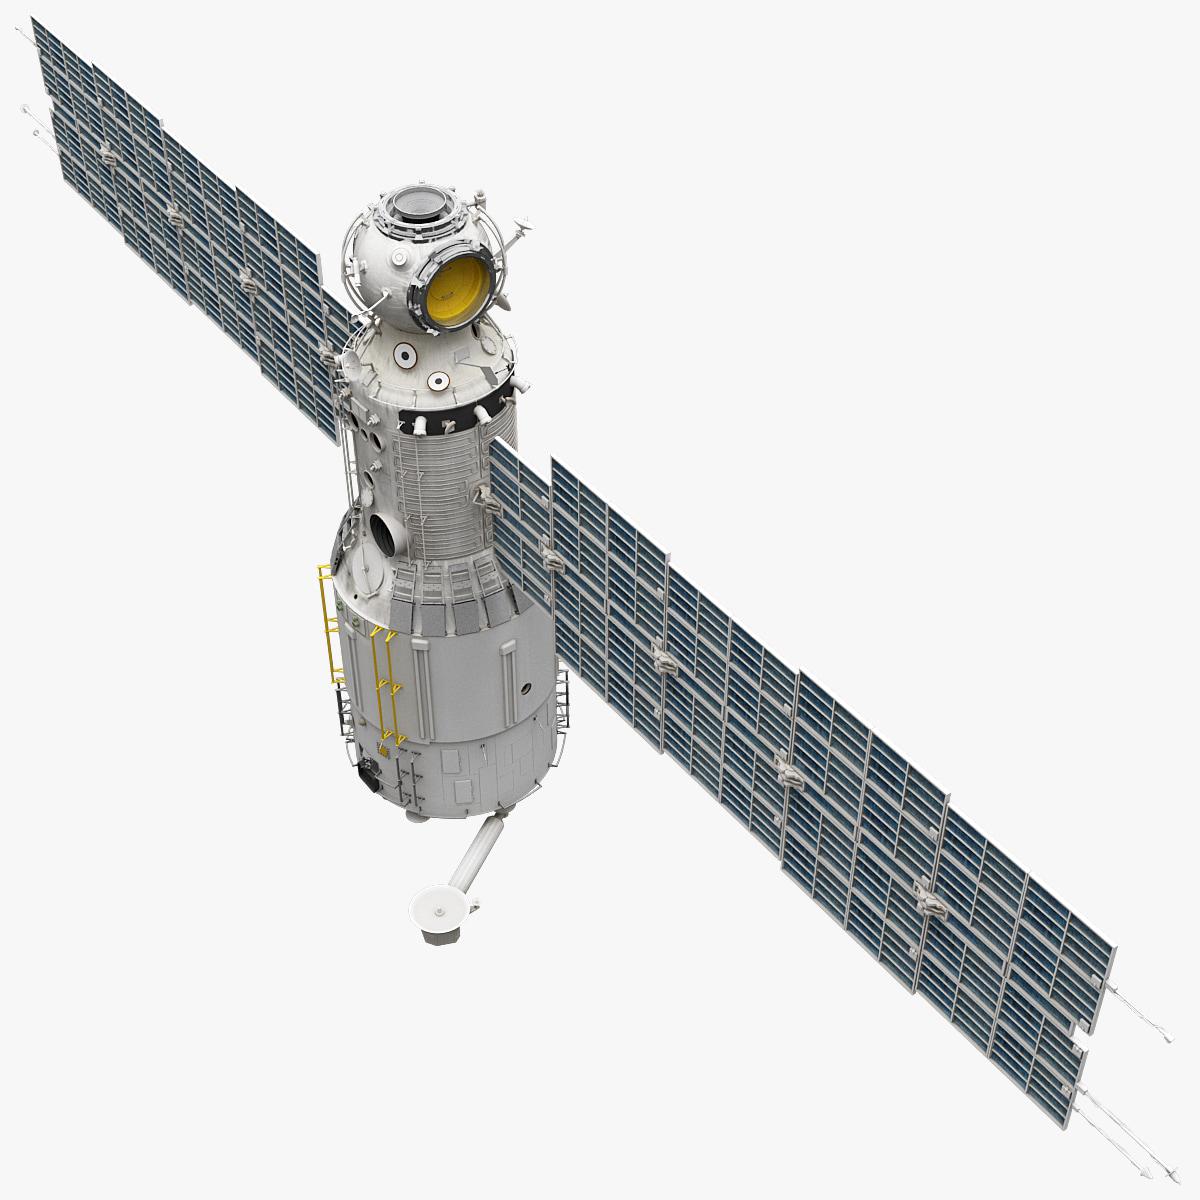 Space_Service_Module_Zvezda_0002.jpg